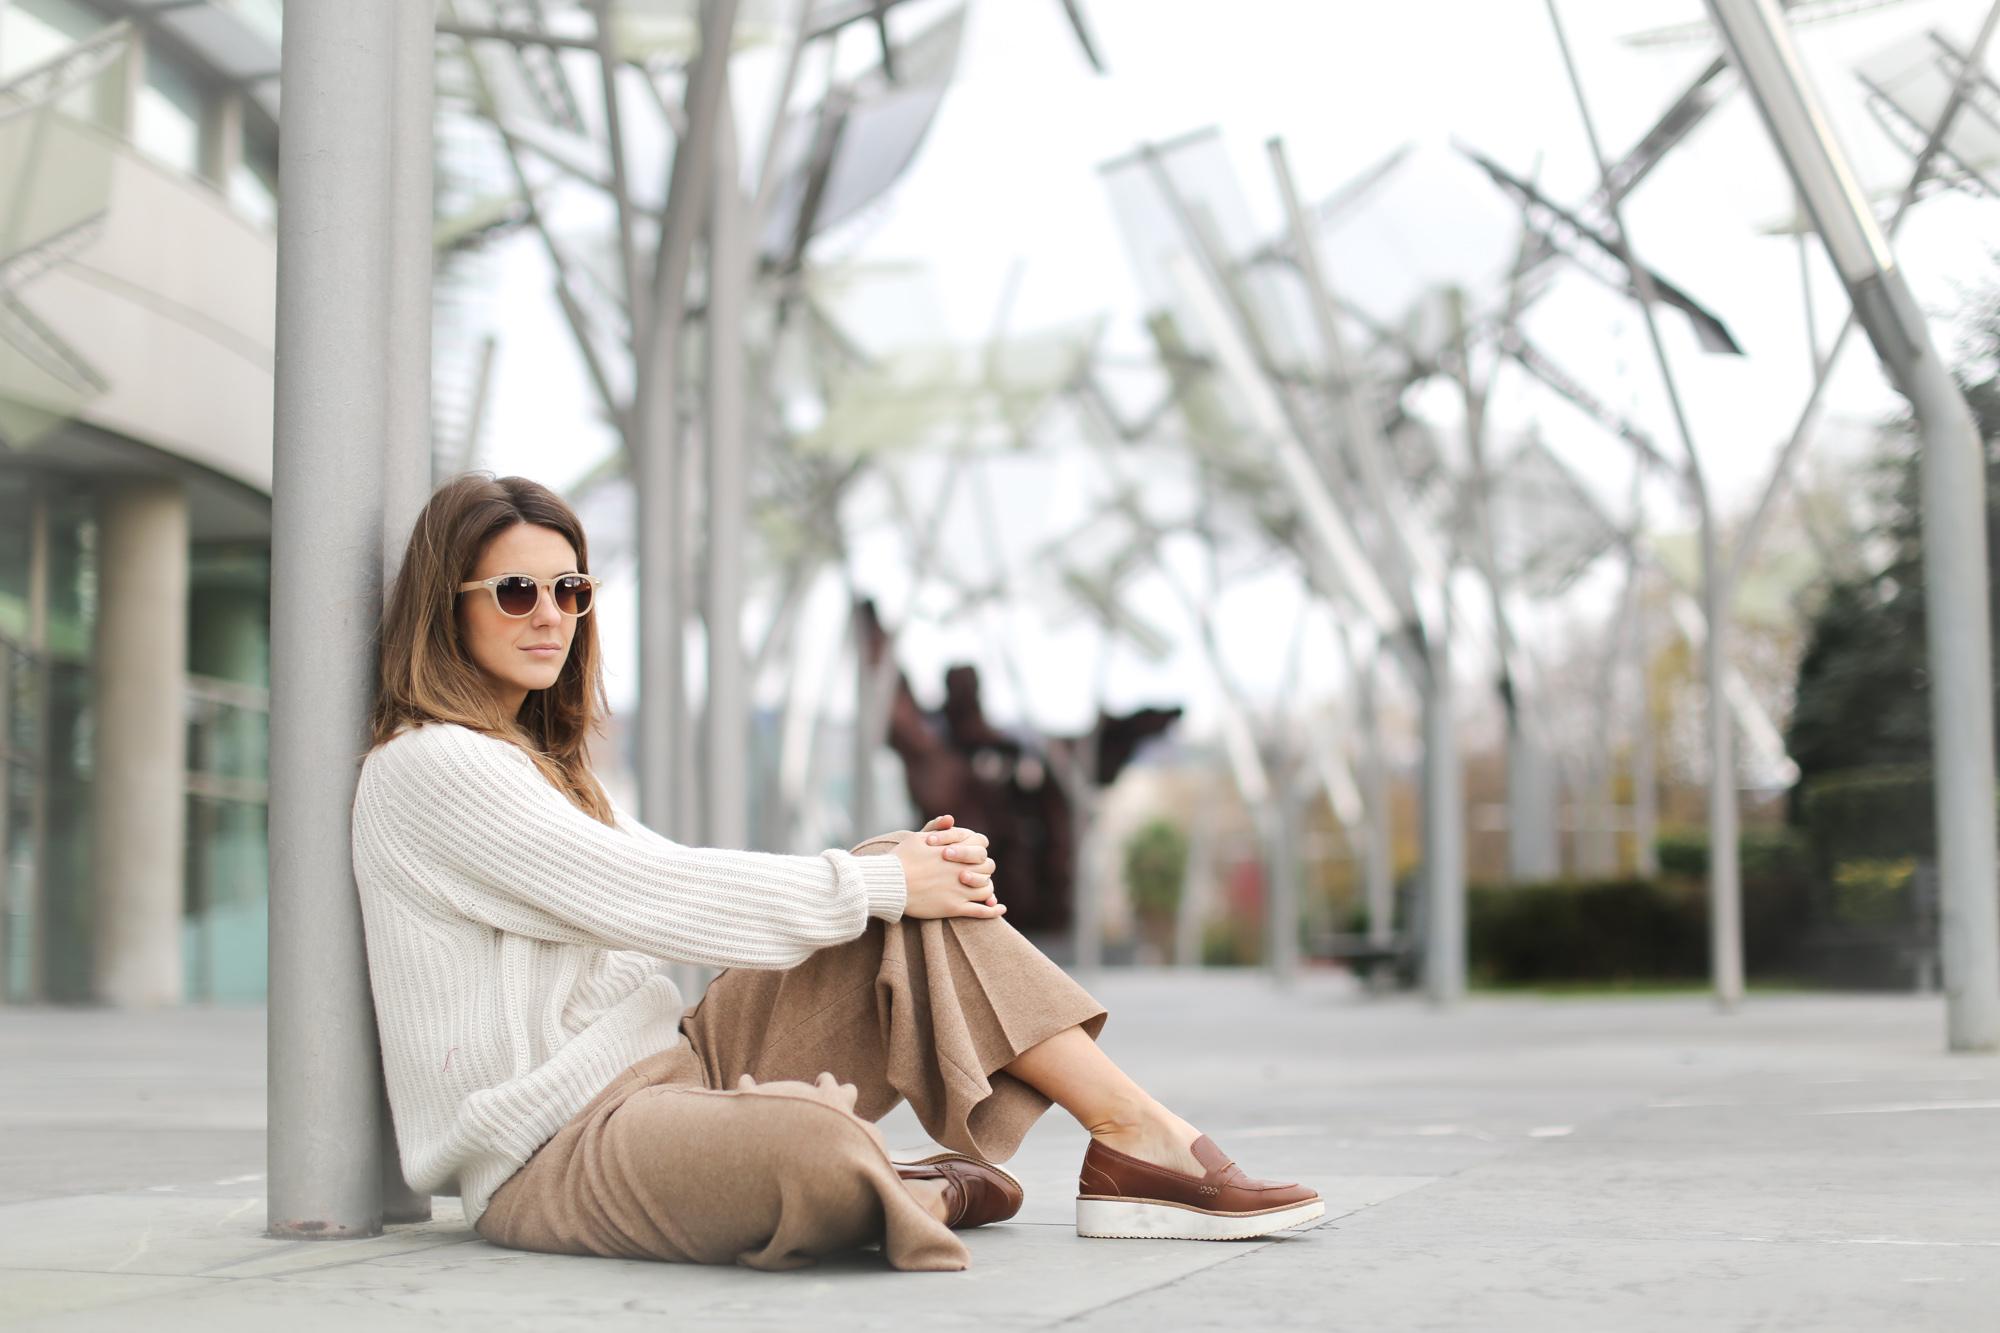 Clochet-streetstyle-szara-camel-wool-culottes-platforms-beige-knit-11